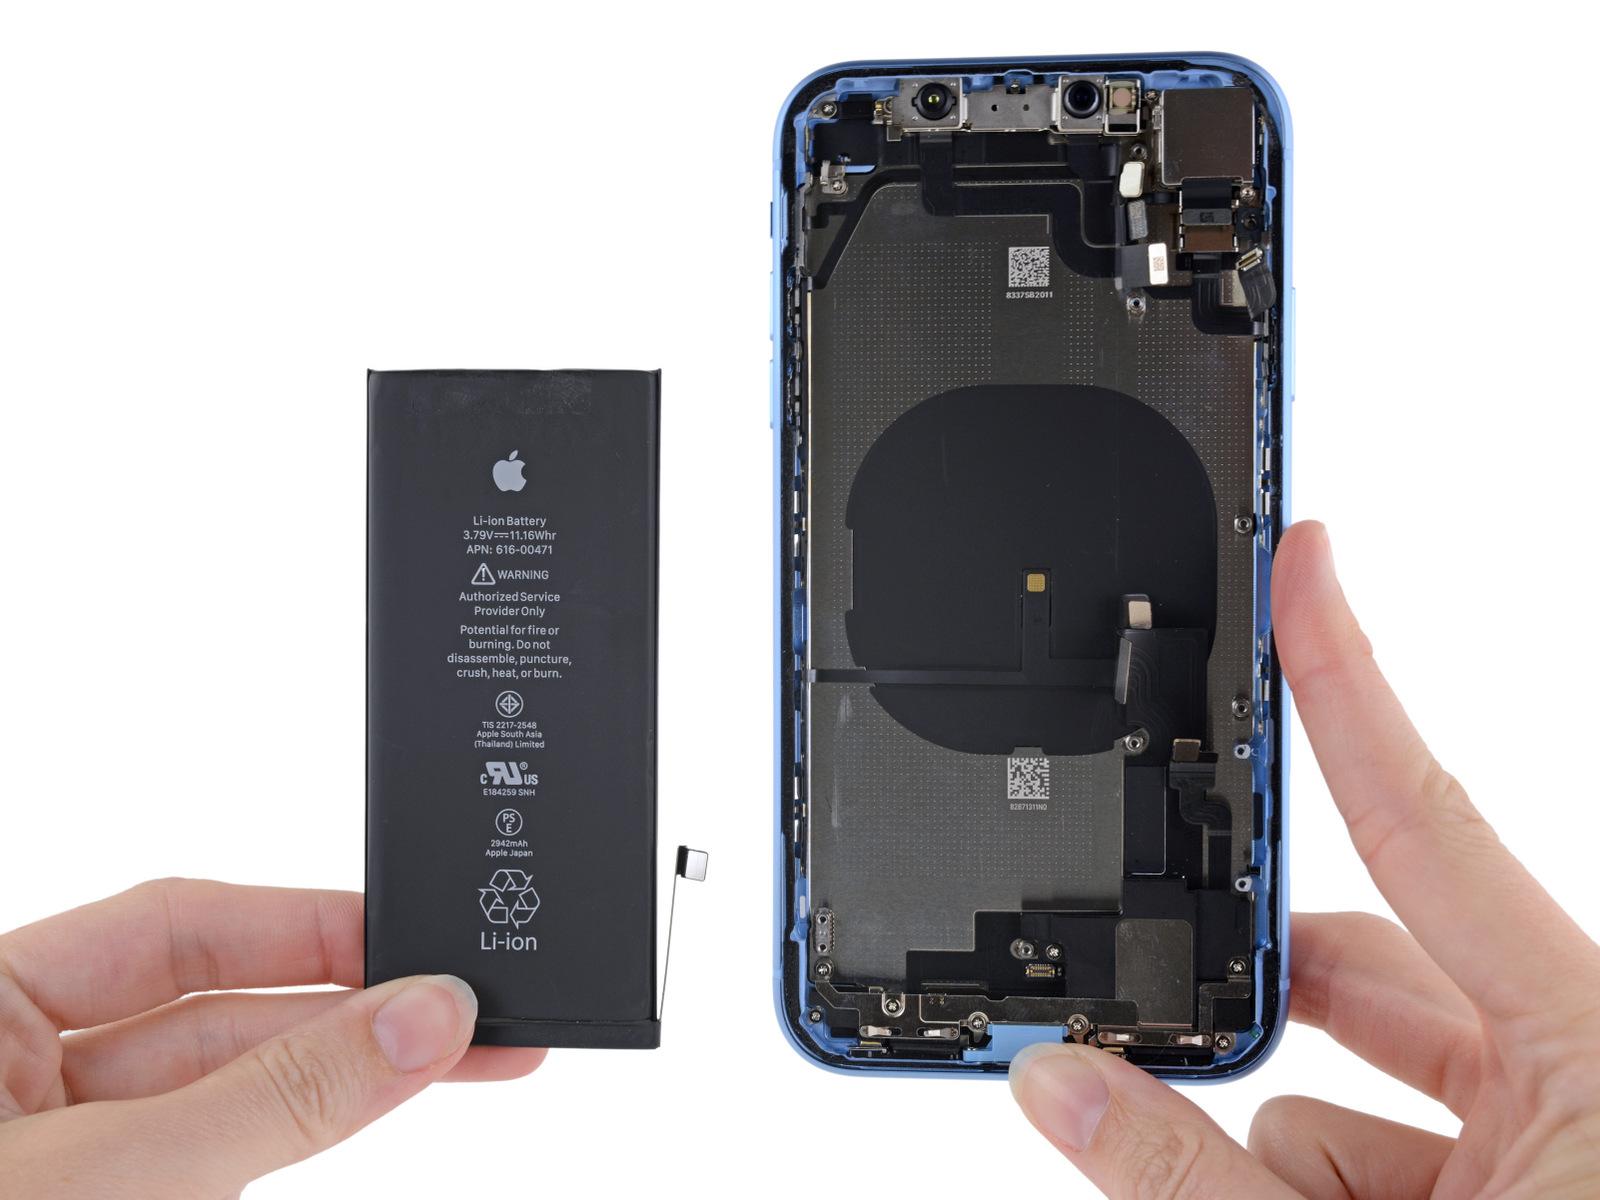 Apple iPhone XR разобран экспертами iFixit - фото 3 | Сервисный центр Total Apple